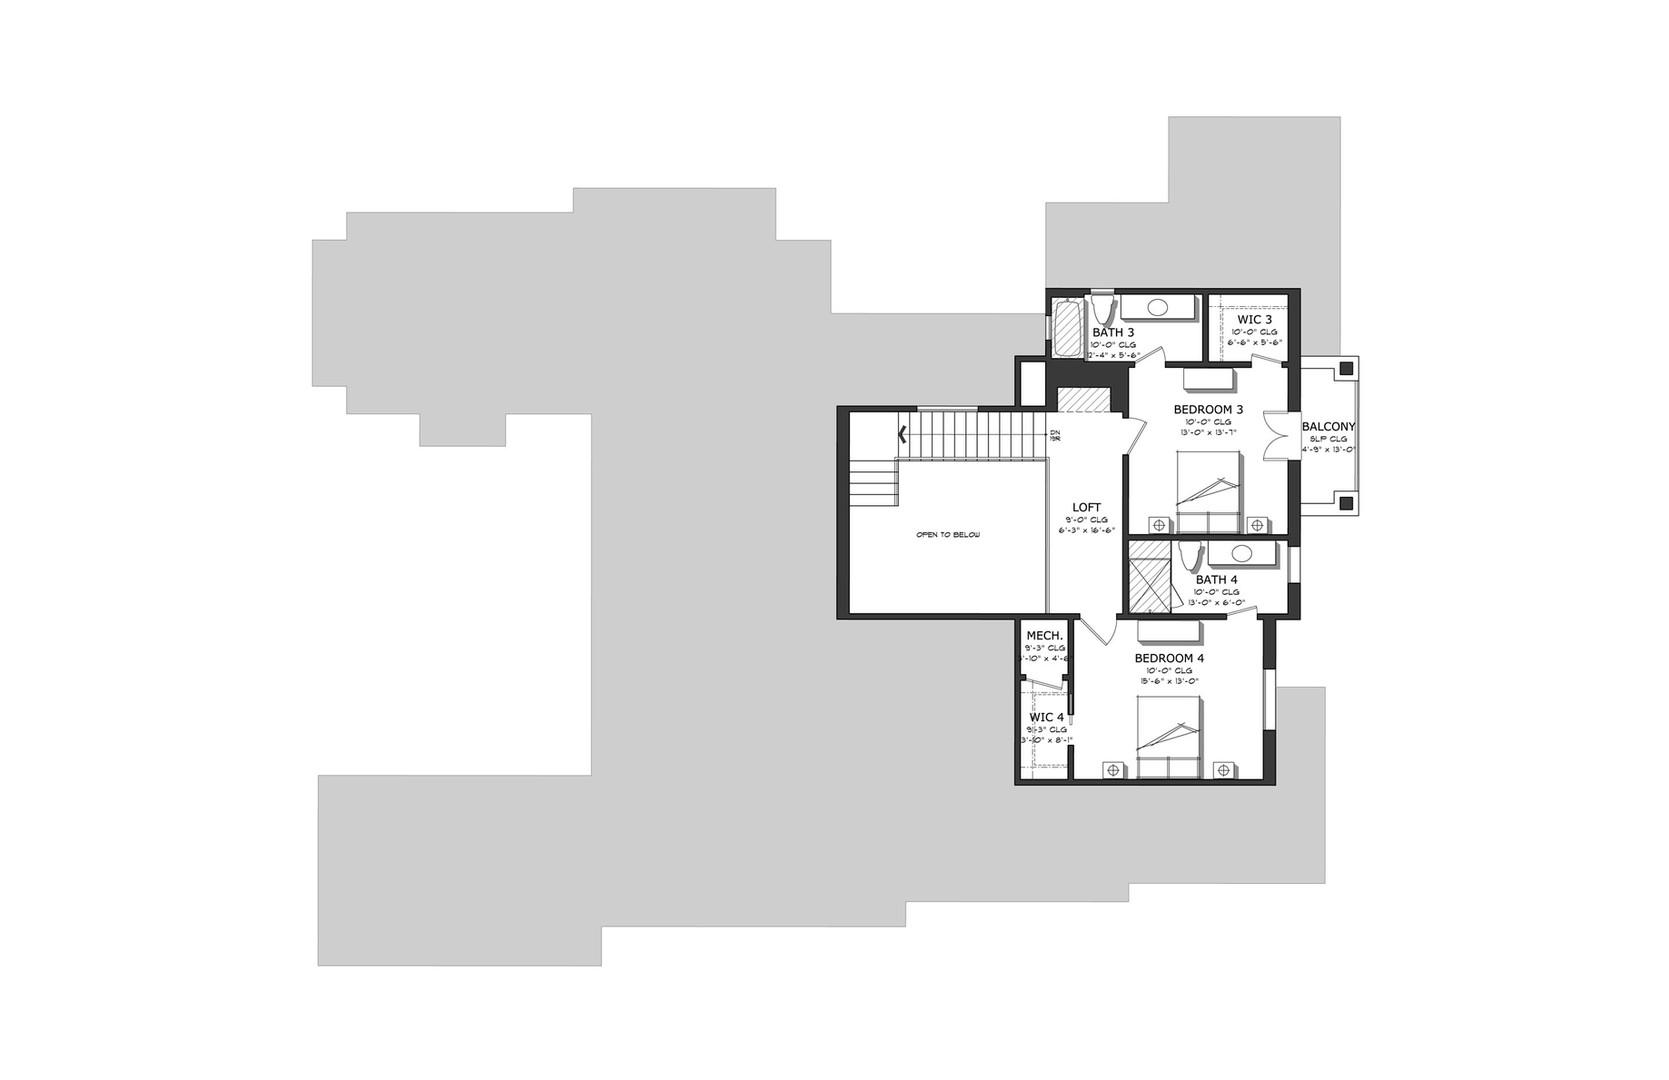 PLan B - 2nd Floor